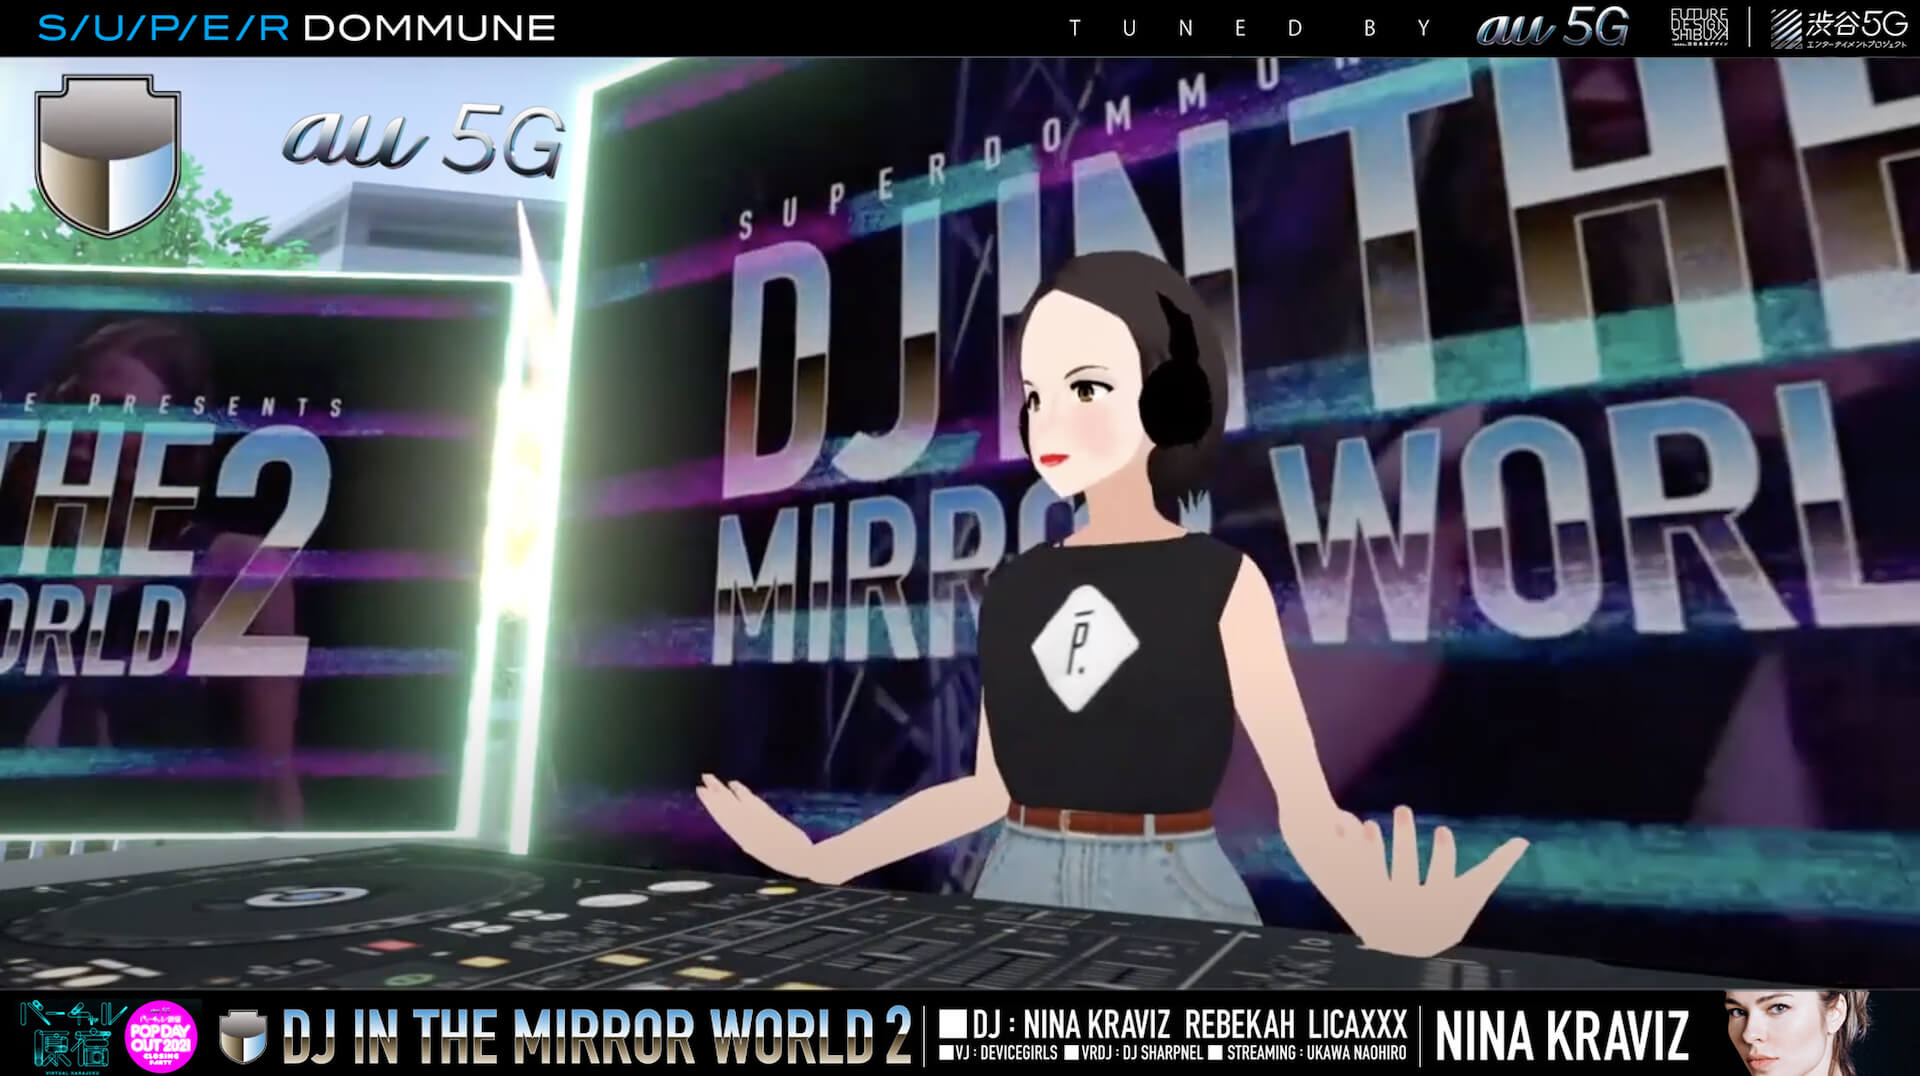 Nina Kraviz、Rebekah、Licaxxxが登場した<DJ IN THE MIRROR WORLD VOL.2>DJイベントのフル尺映像がアーカイブとして公開中! music210603_virtualharajuku_4